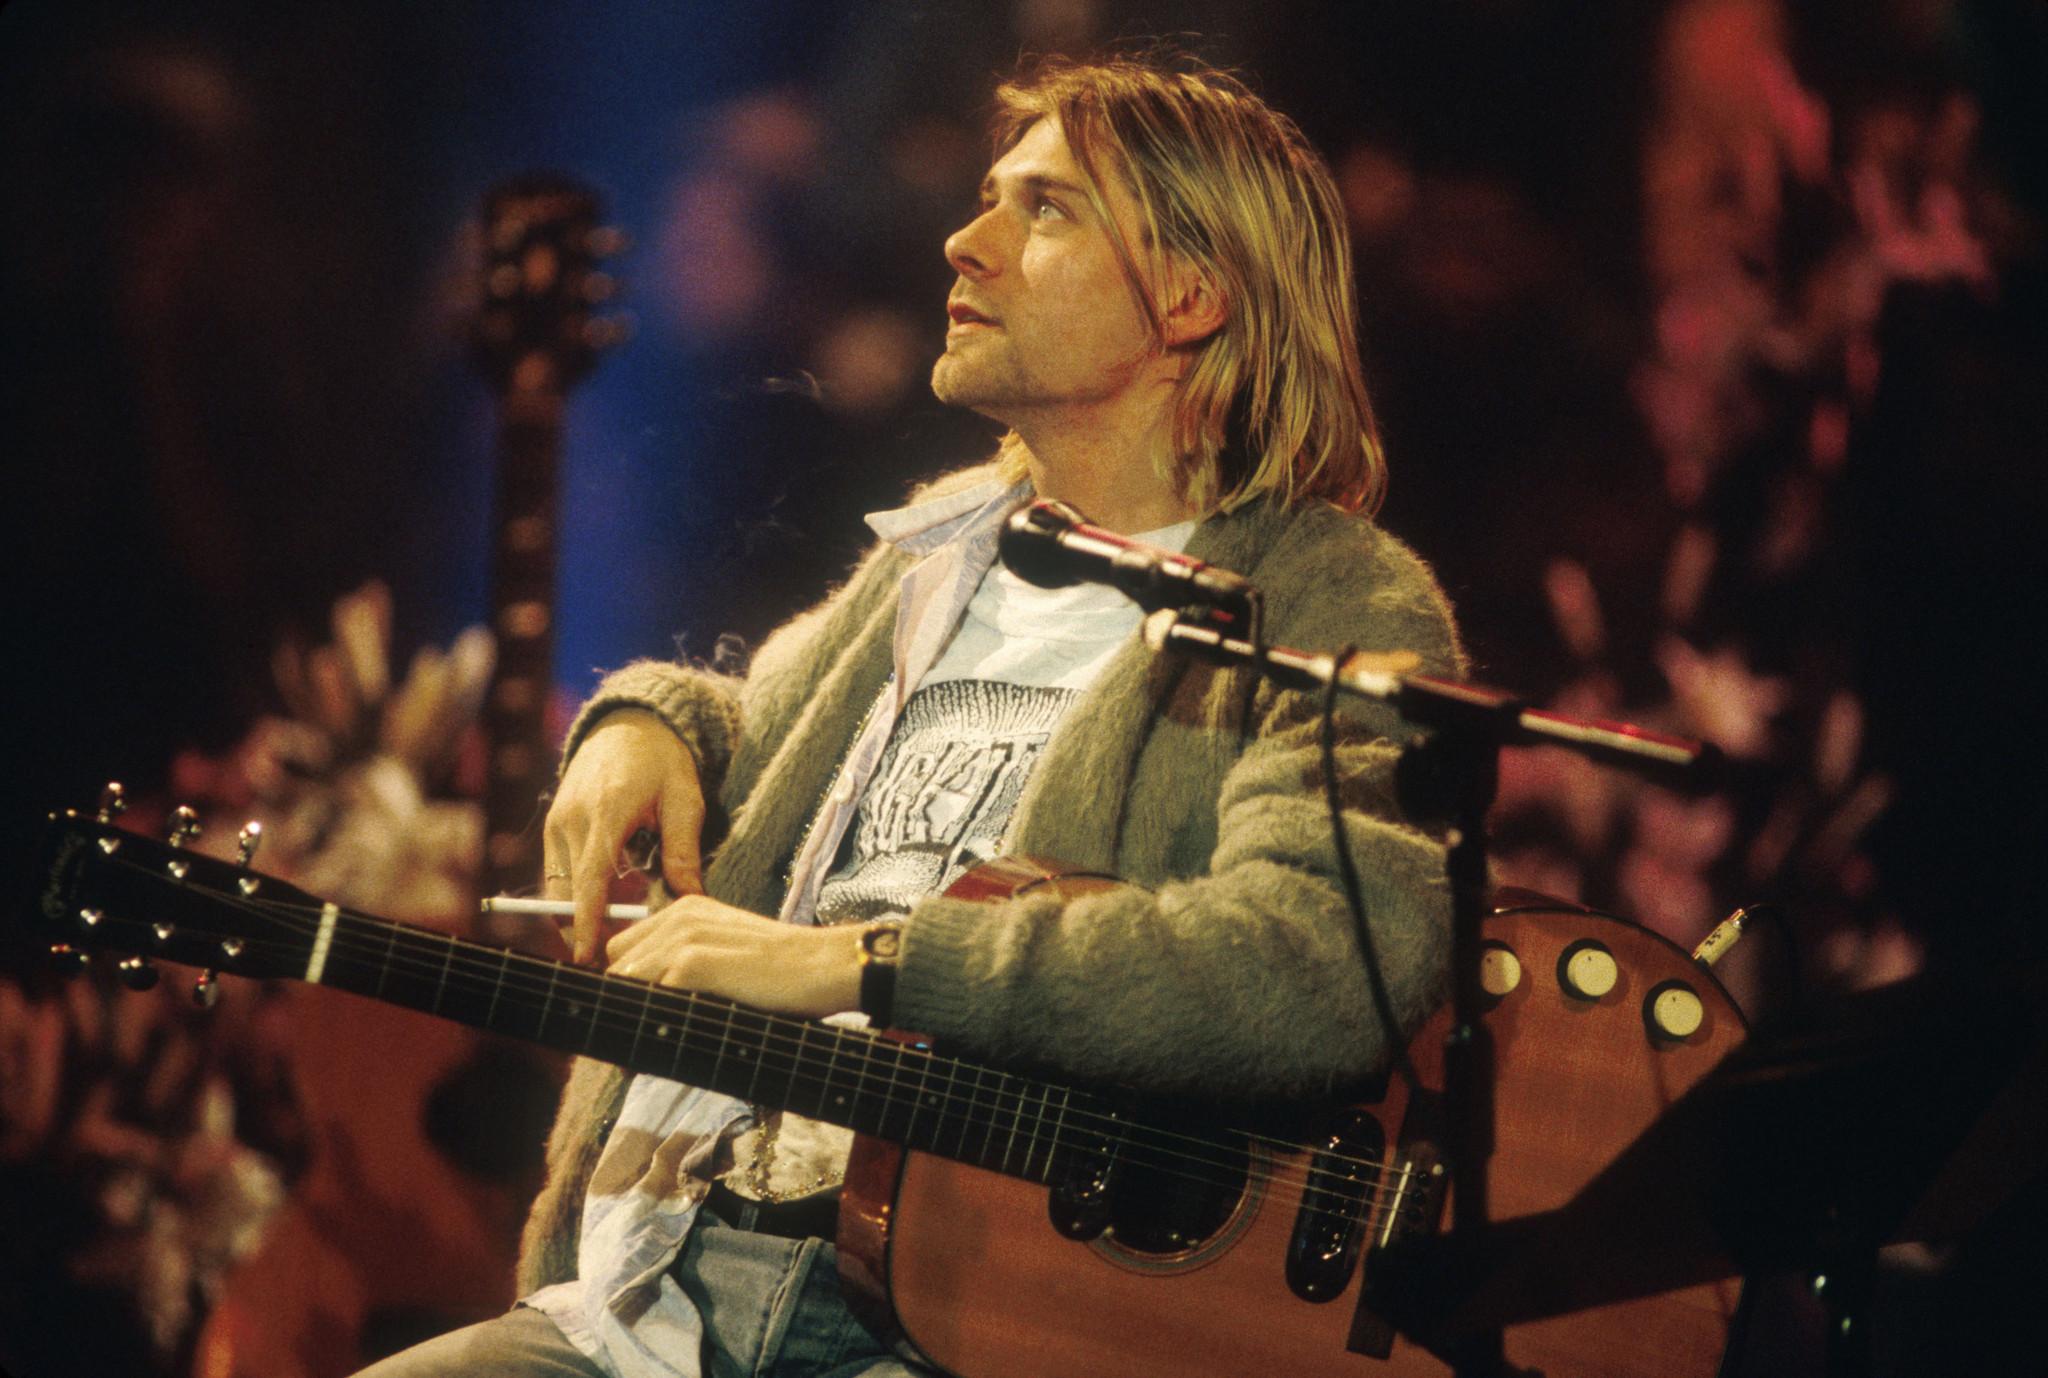 Kurt Cobain S Montage Of Heck Mixtape Surfaces La Times 80s Music Artists Best Rock Bands Ever